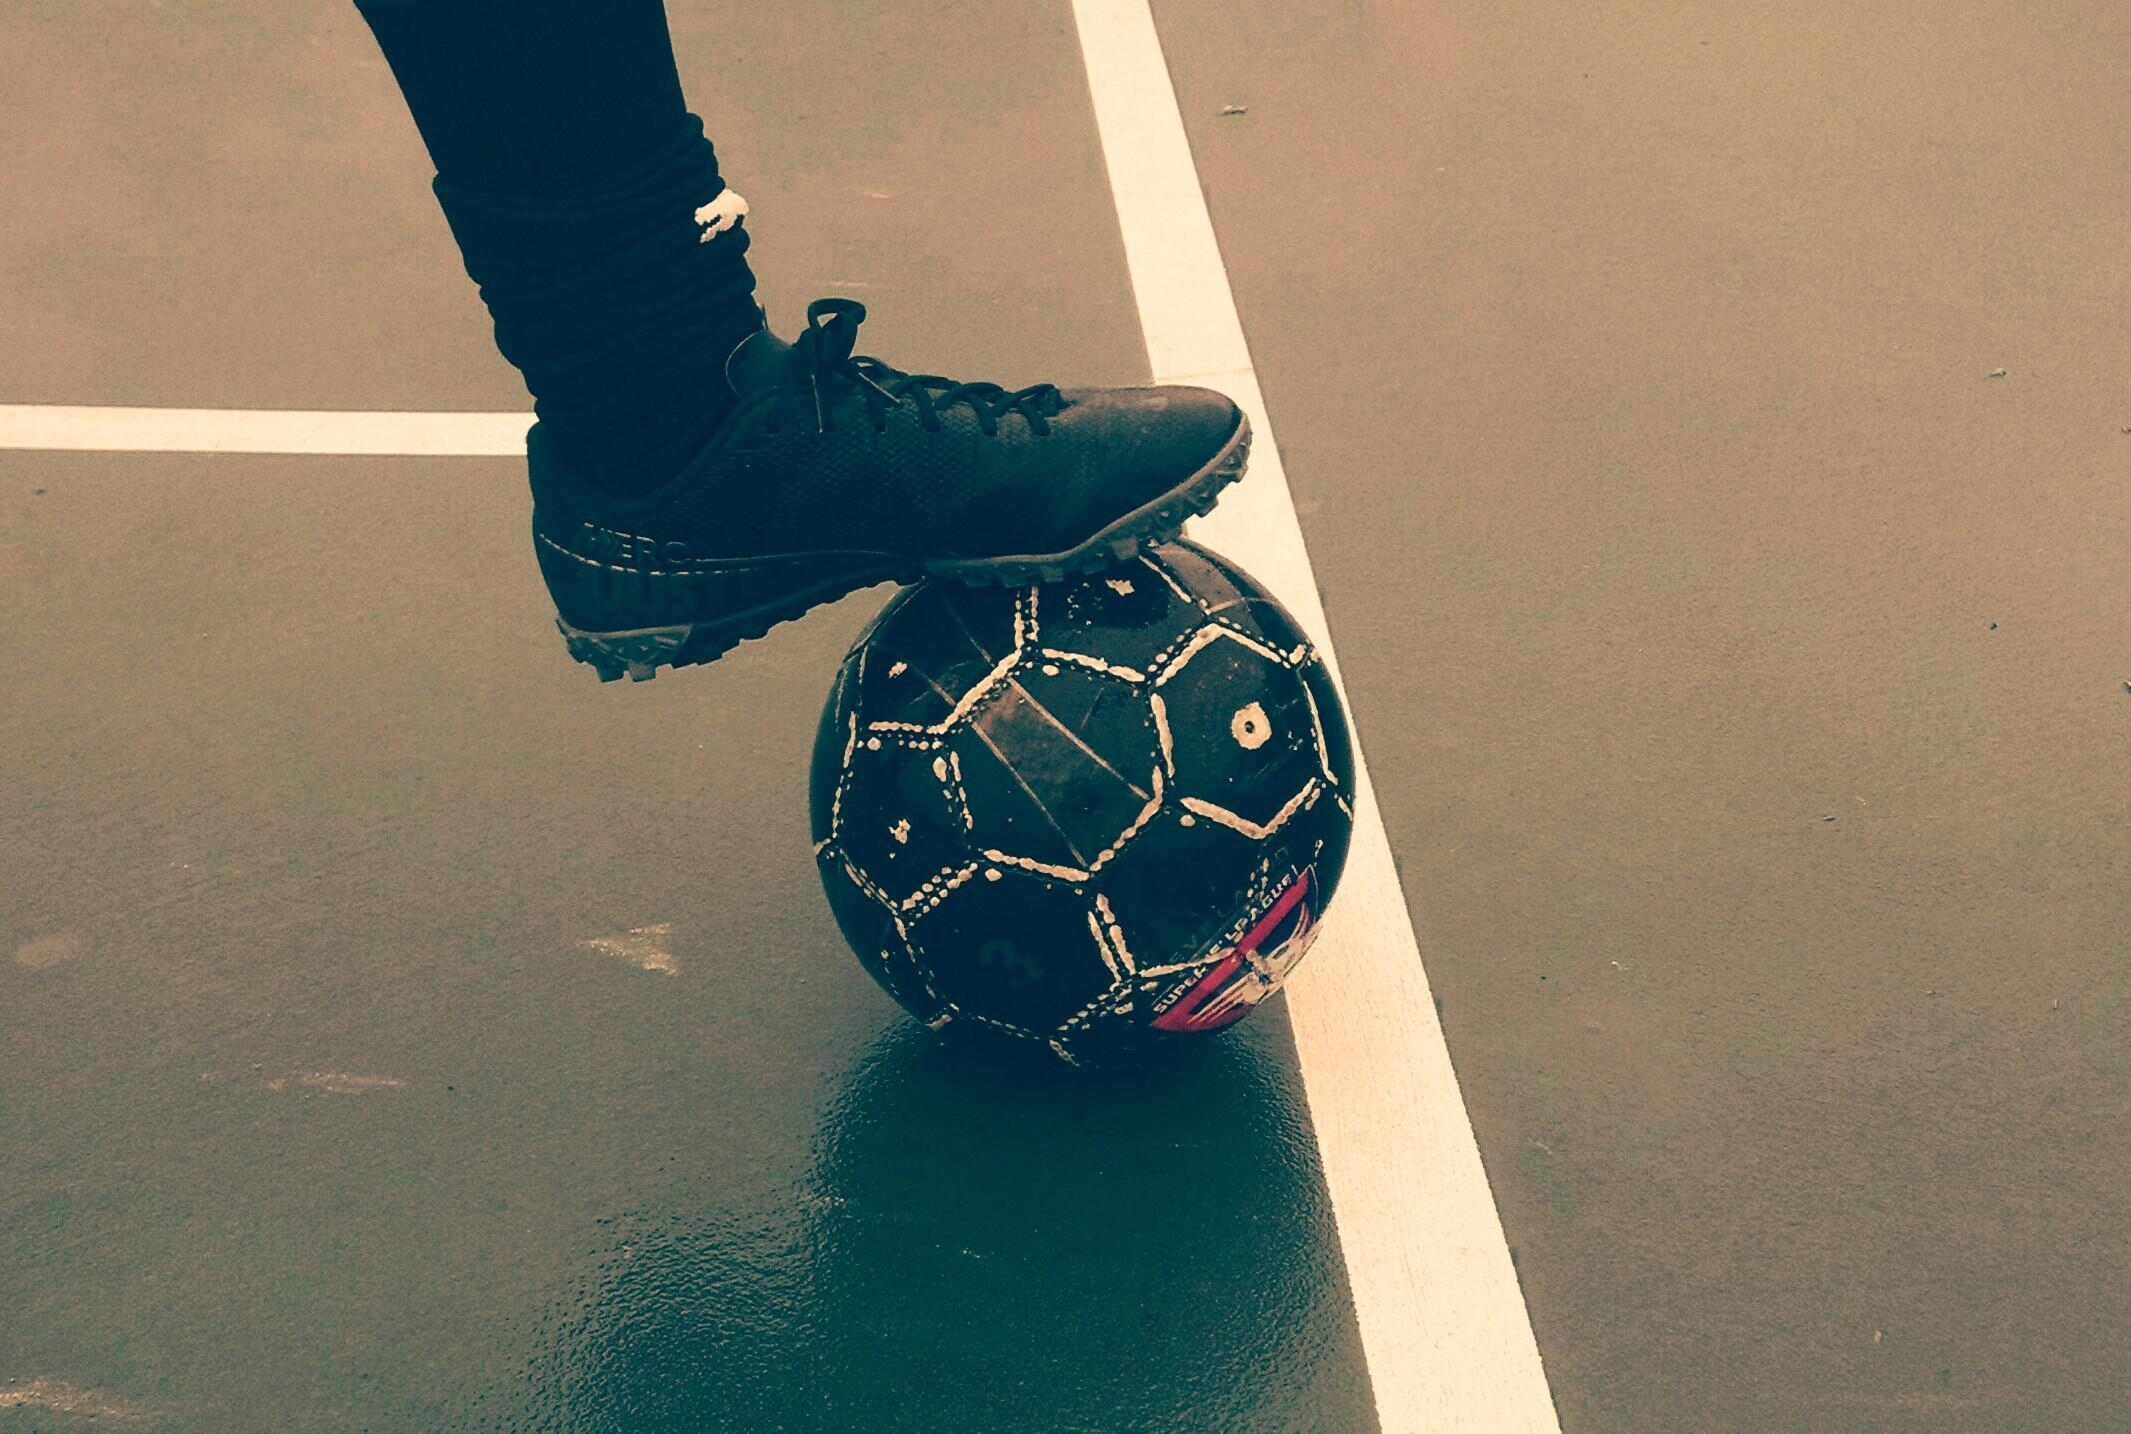 soccer player with ball futsal court